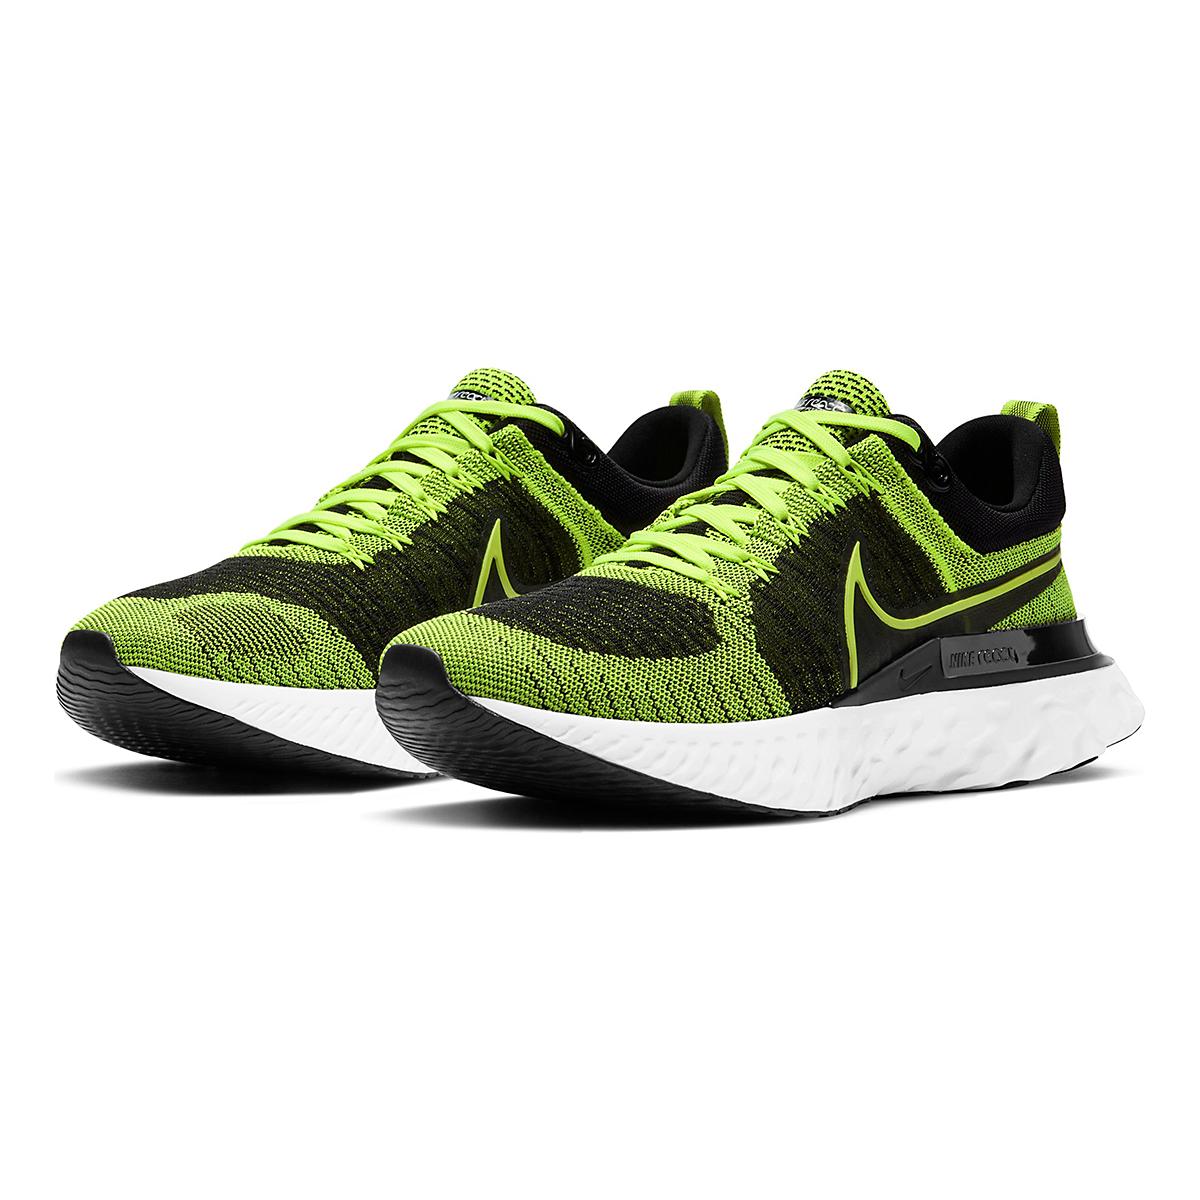 Men's Nike React Infinity Run Flyknit 2 Running Shoe - Color: Volt/Black - Size: 6 - Width: Regular, Volt/Black, large, image 3